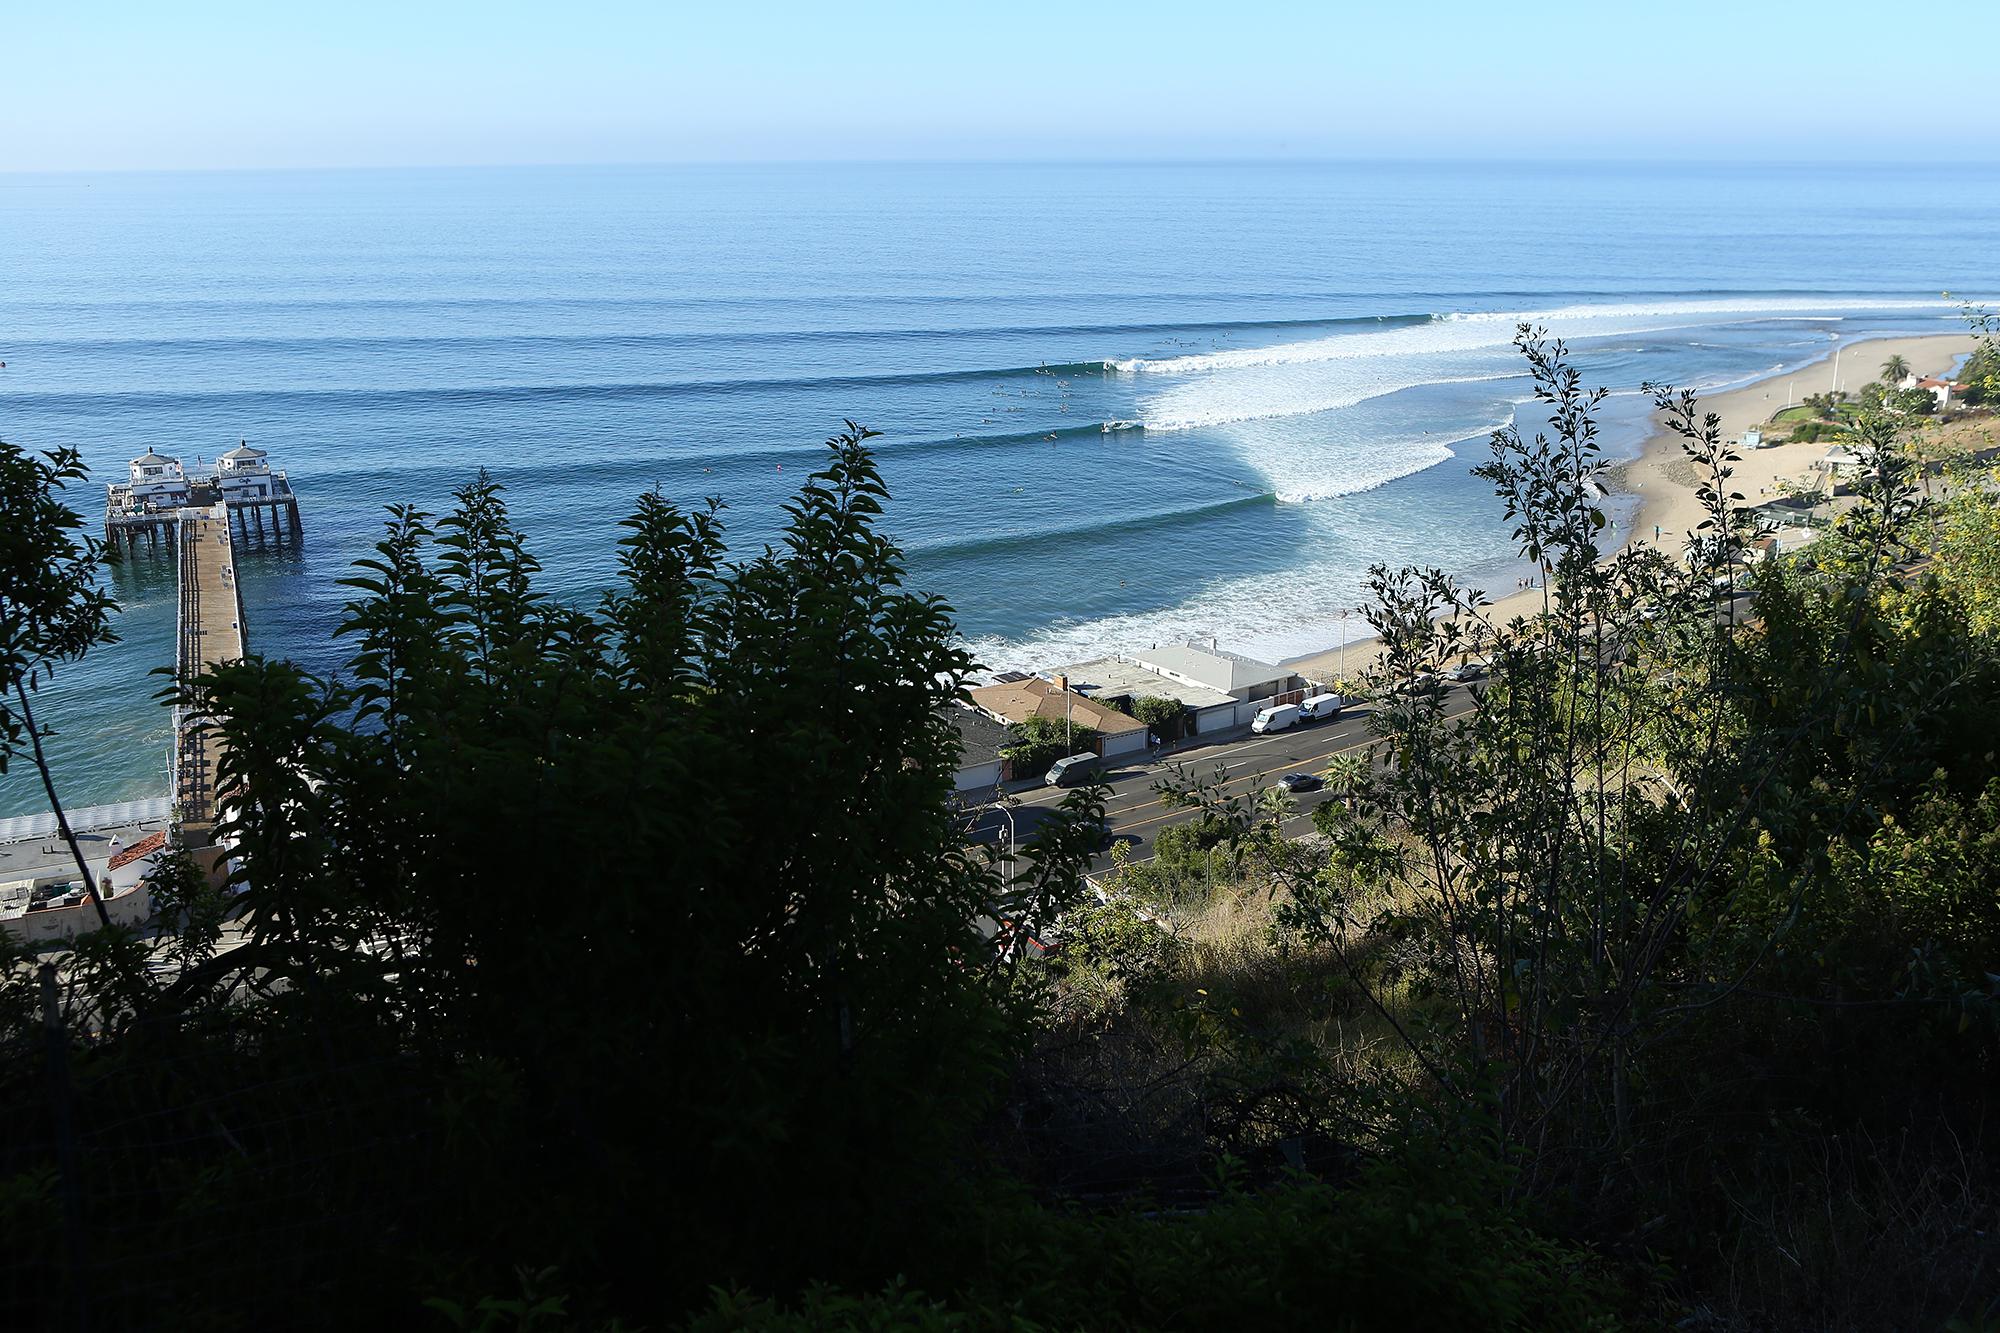 SoCal Goes Boom Over Fourth of July – Surfline.com Surf News